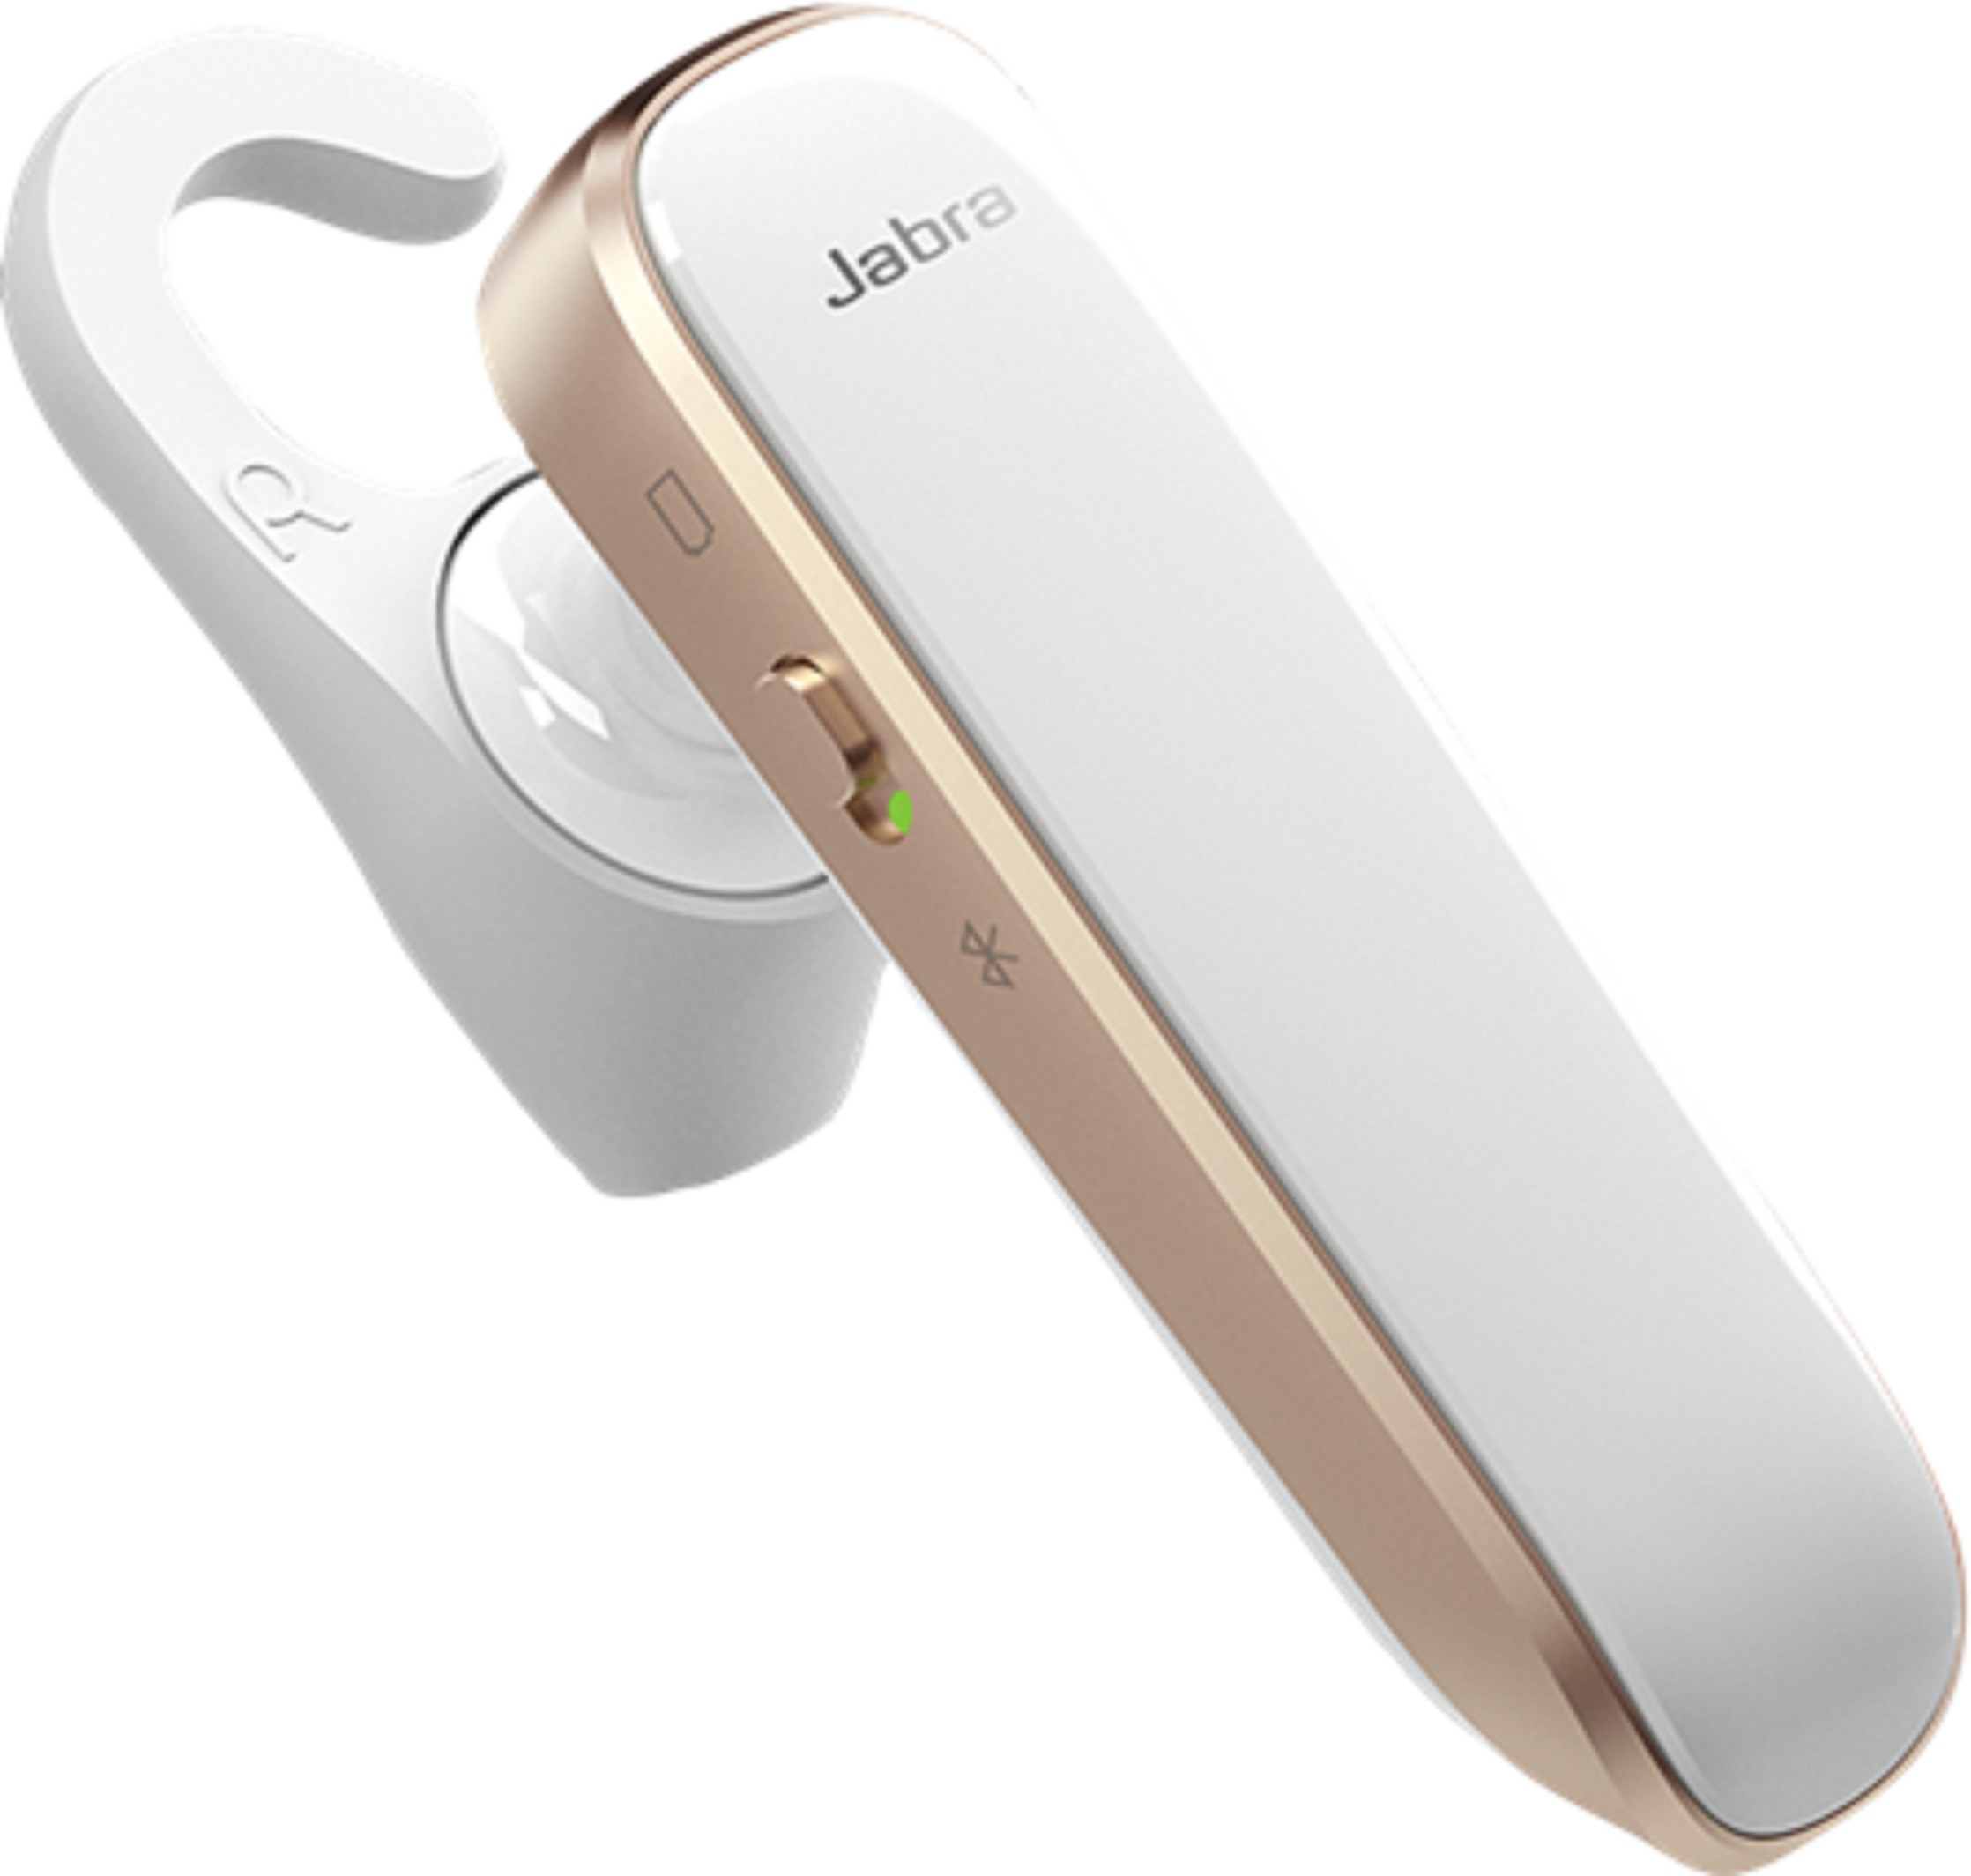 Jabra Boost Golden Wireless Bluetooth Headset With Mic(Gold)